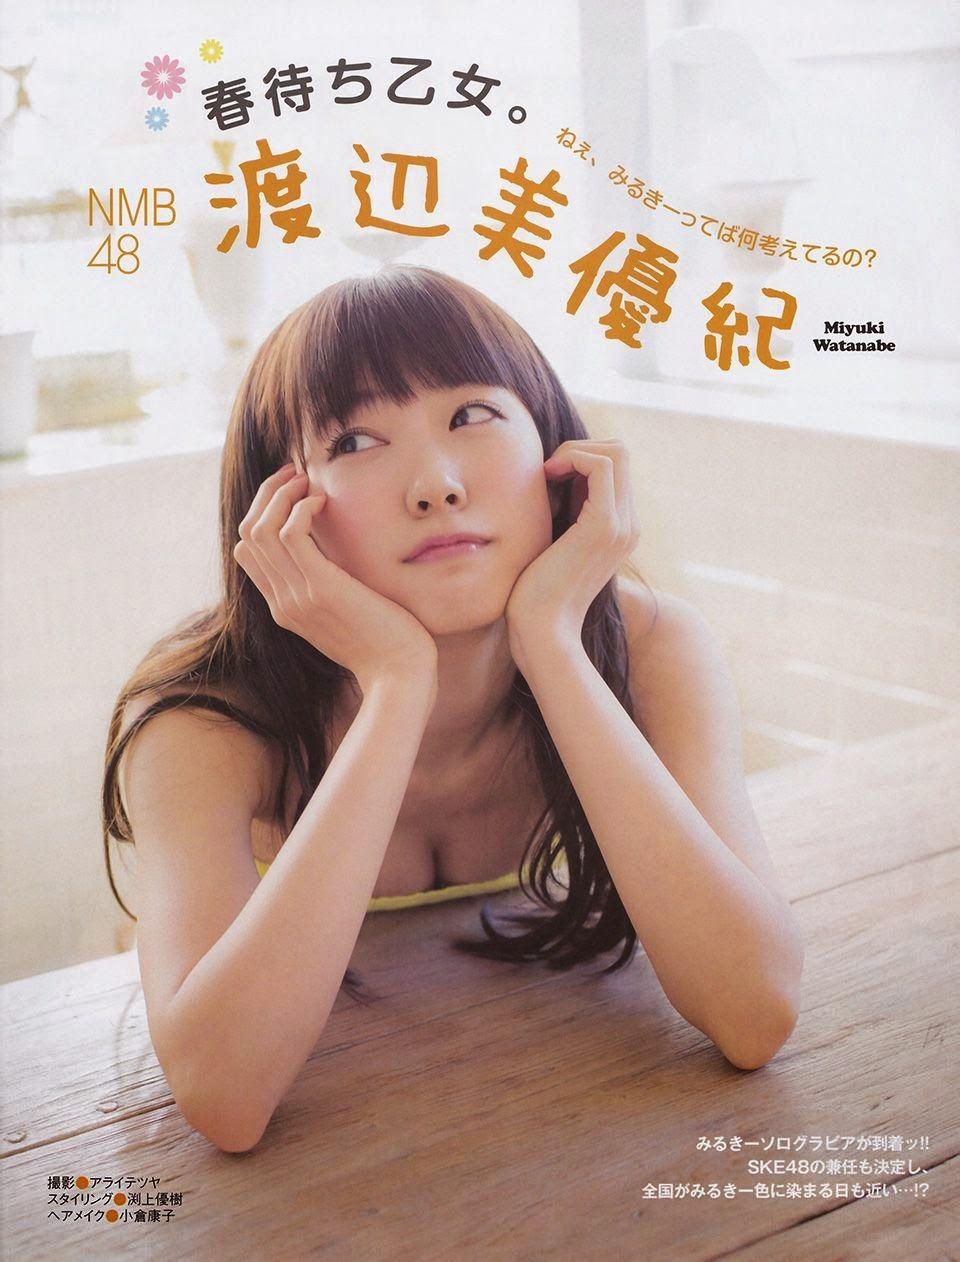 渡辺美優紀 エロ画像 41